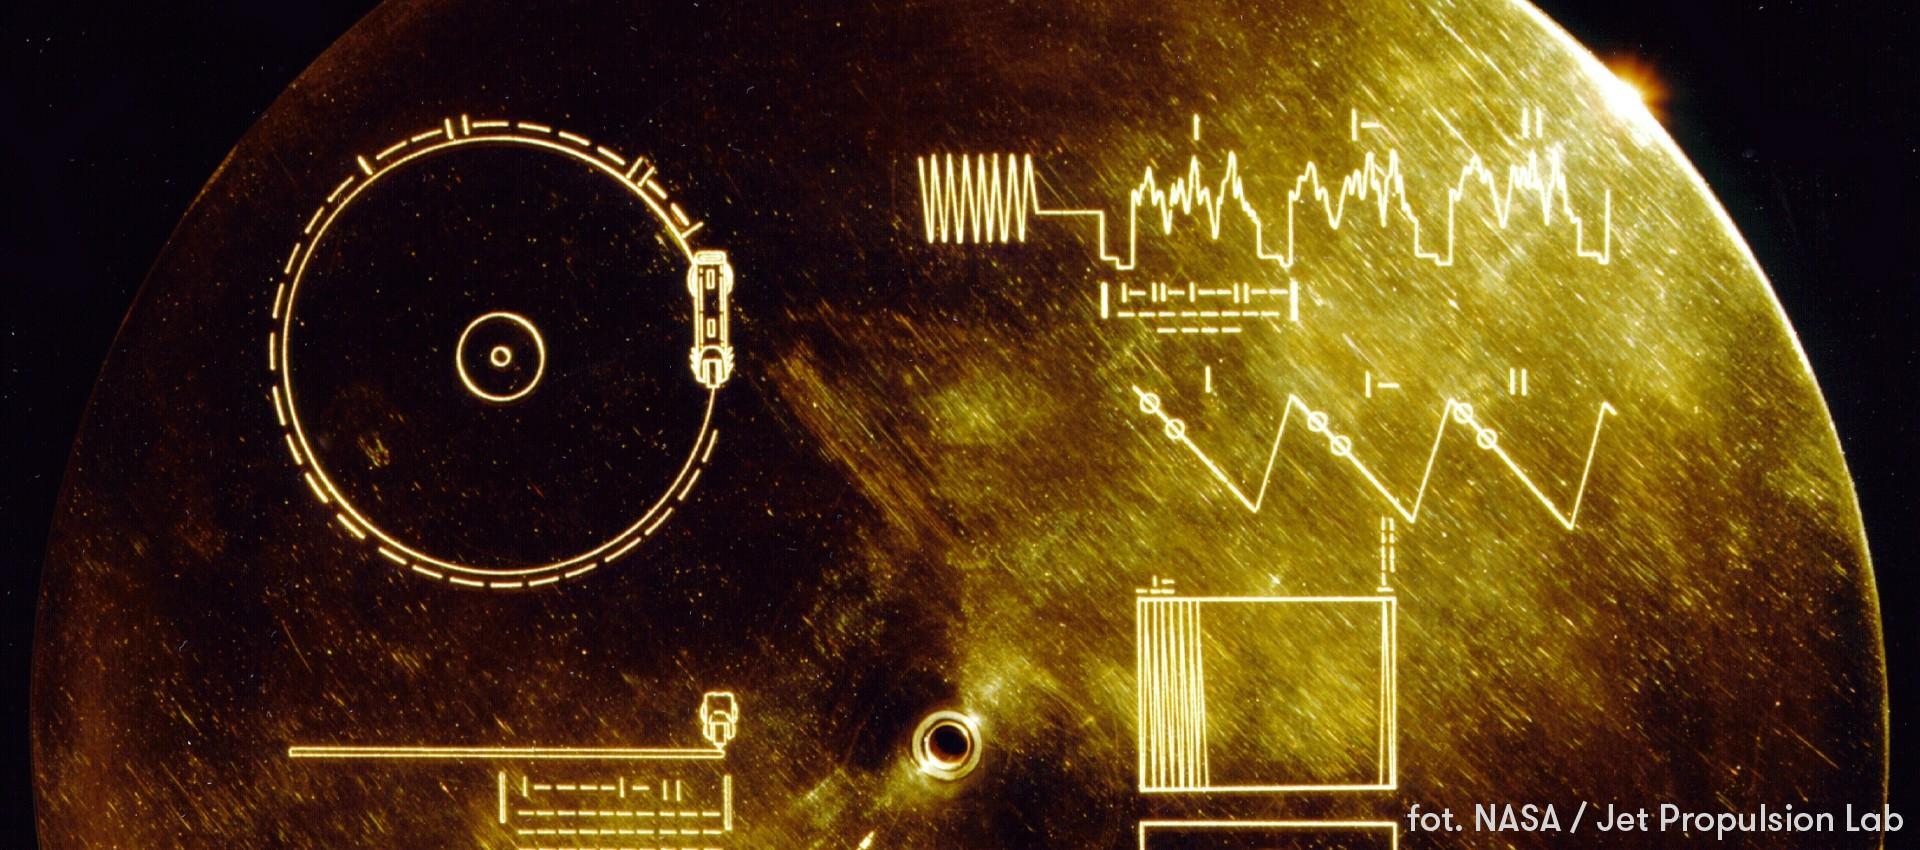 40 lat misji kosmicznej Voyager 1